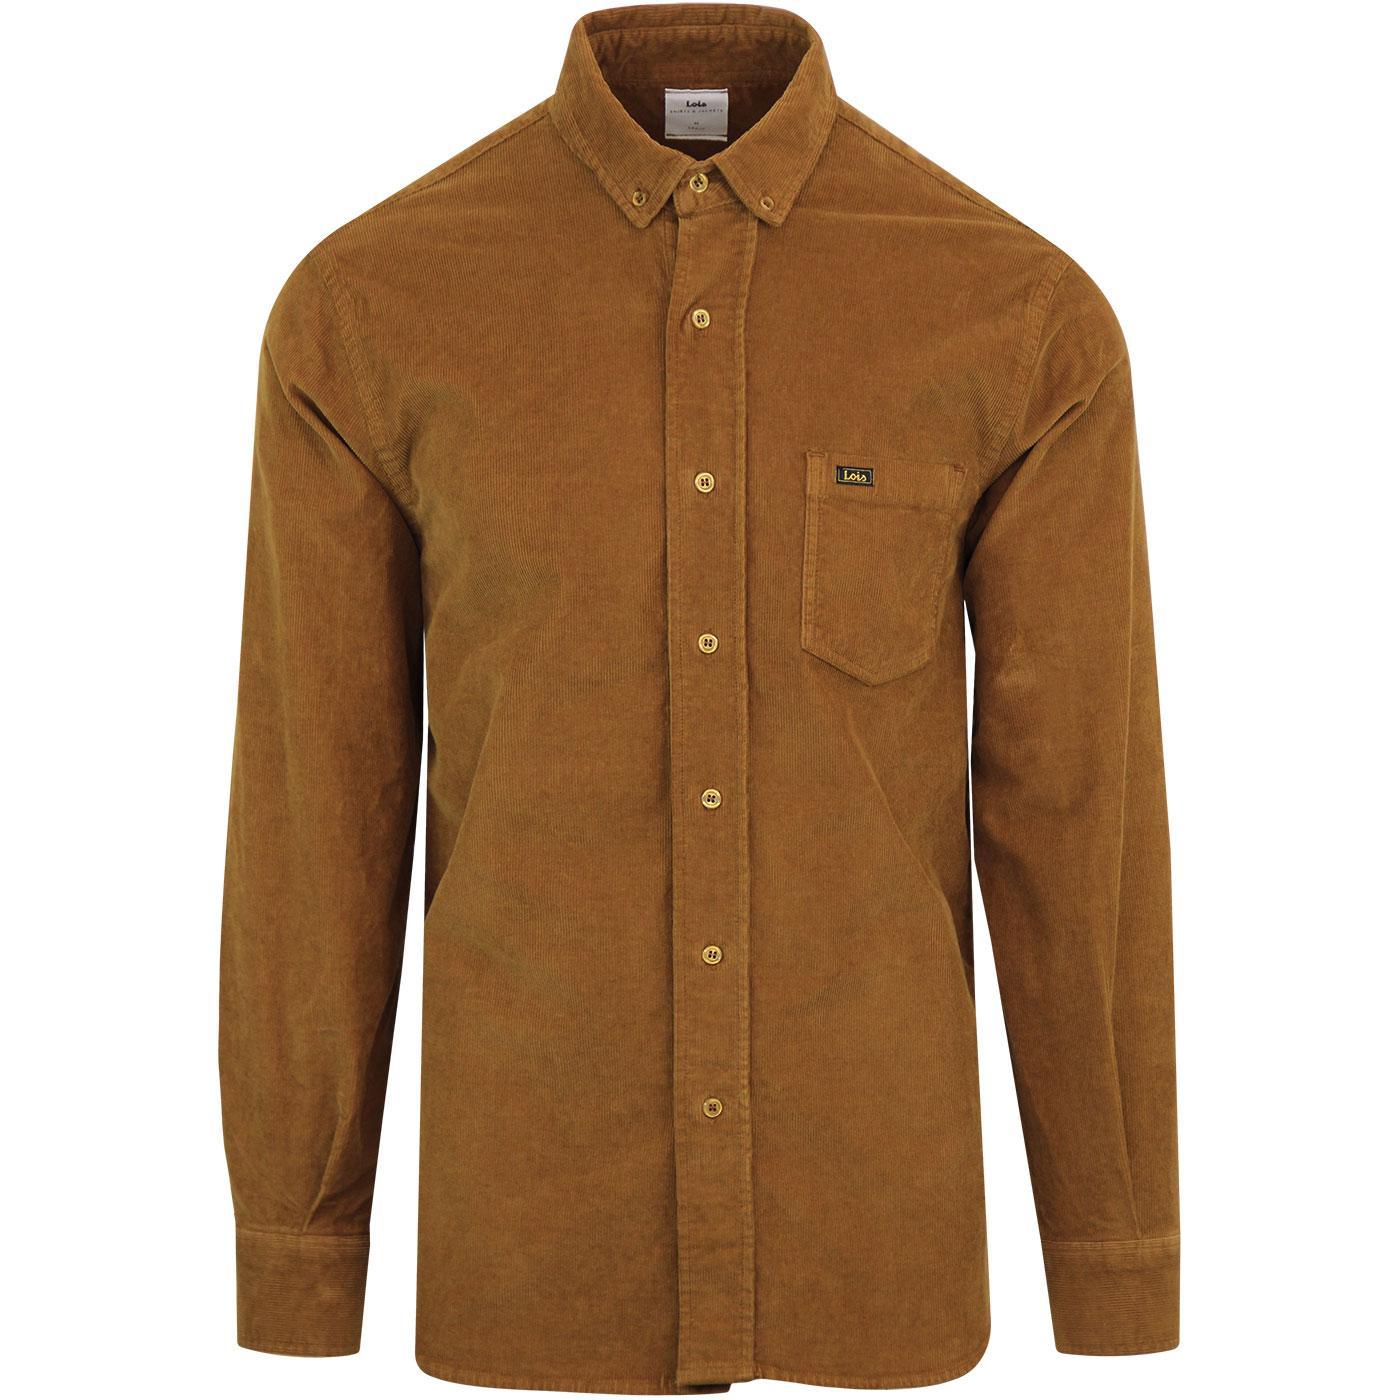 Thomas LOIS JEANS Retro 70s Needle Cord Overshirt